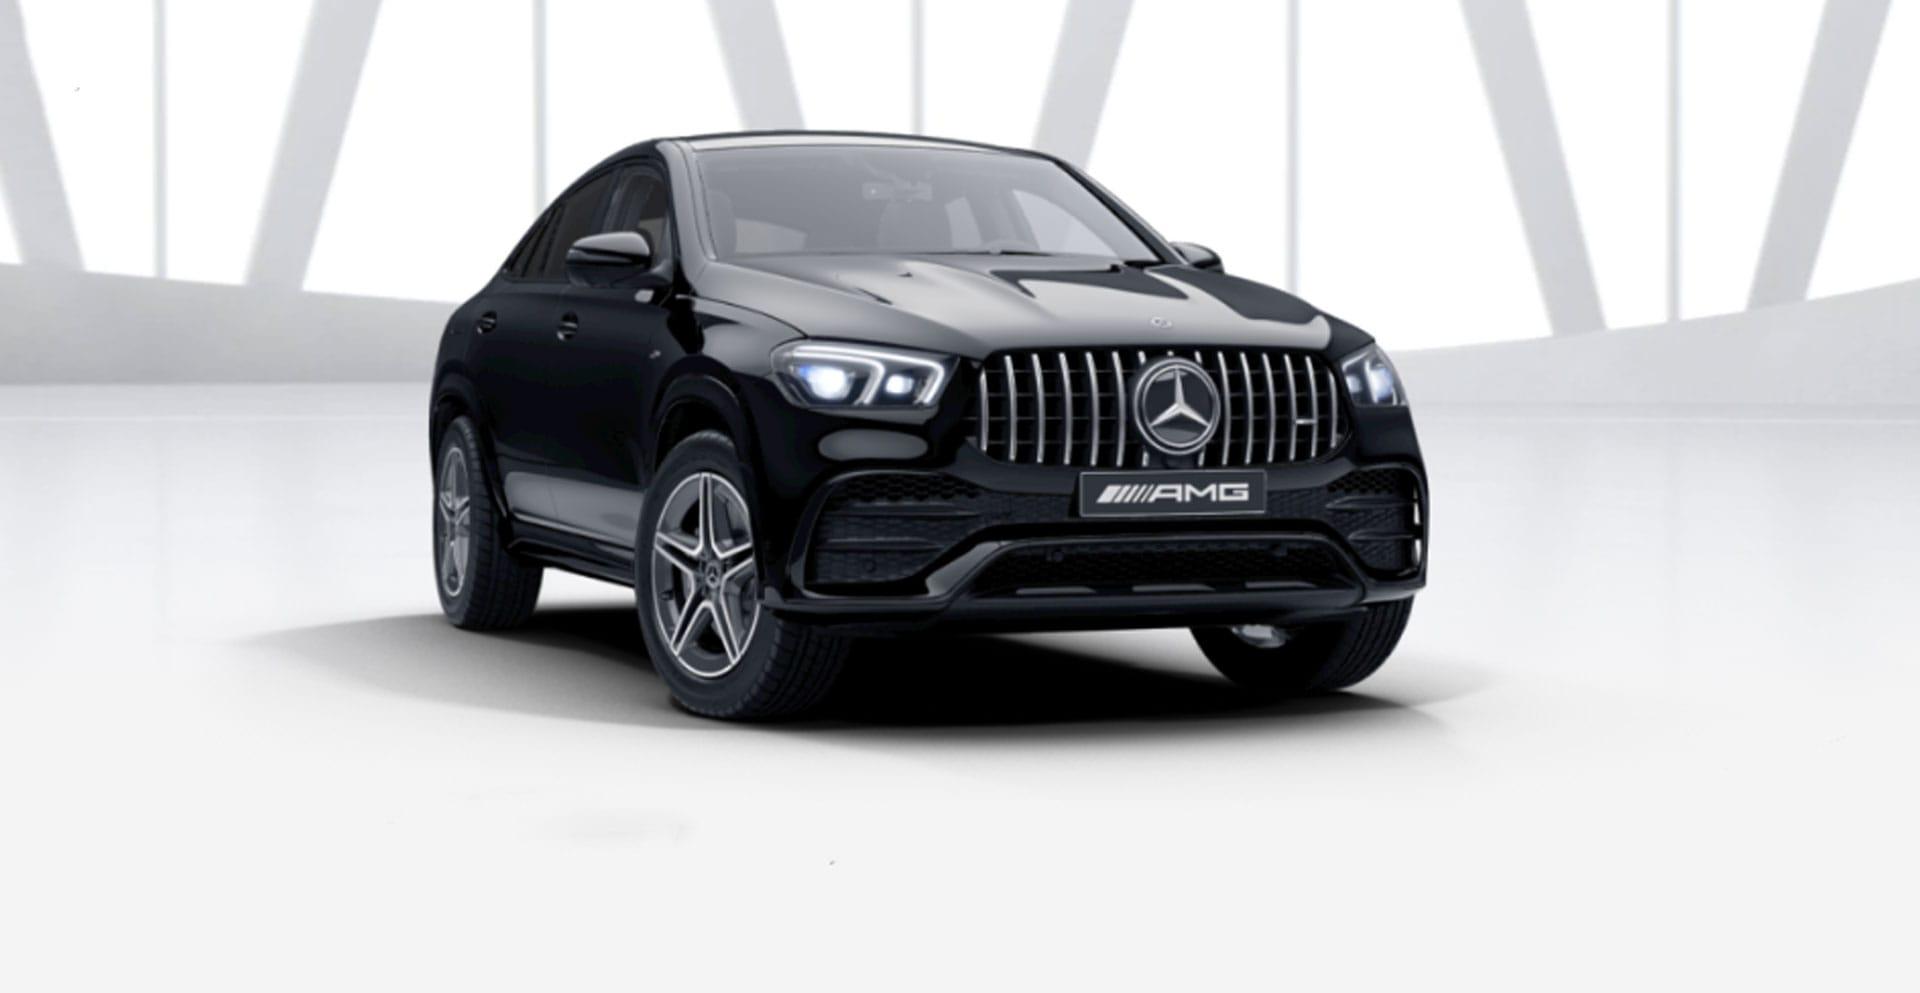 Mercedes-AMG GLE Coupe 0152600458